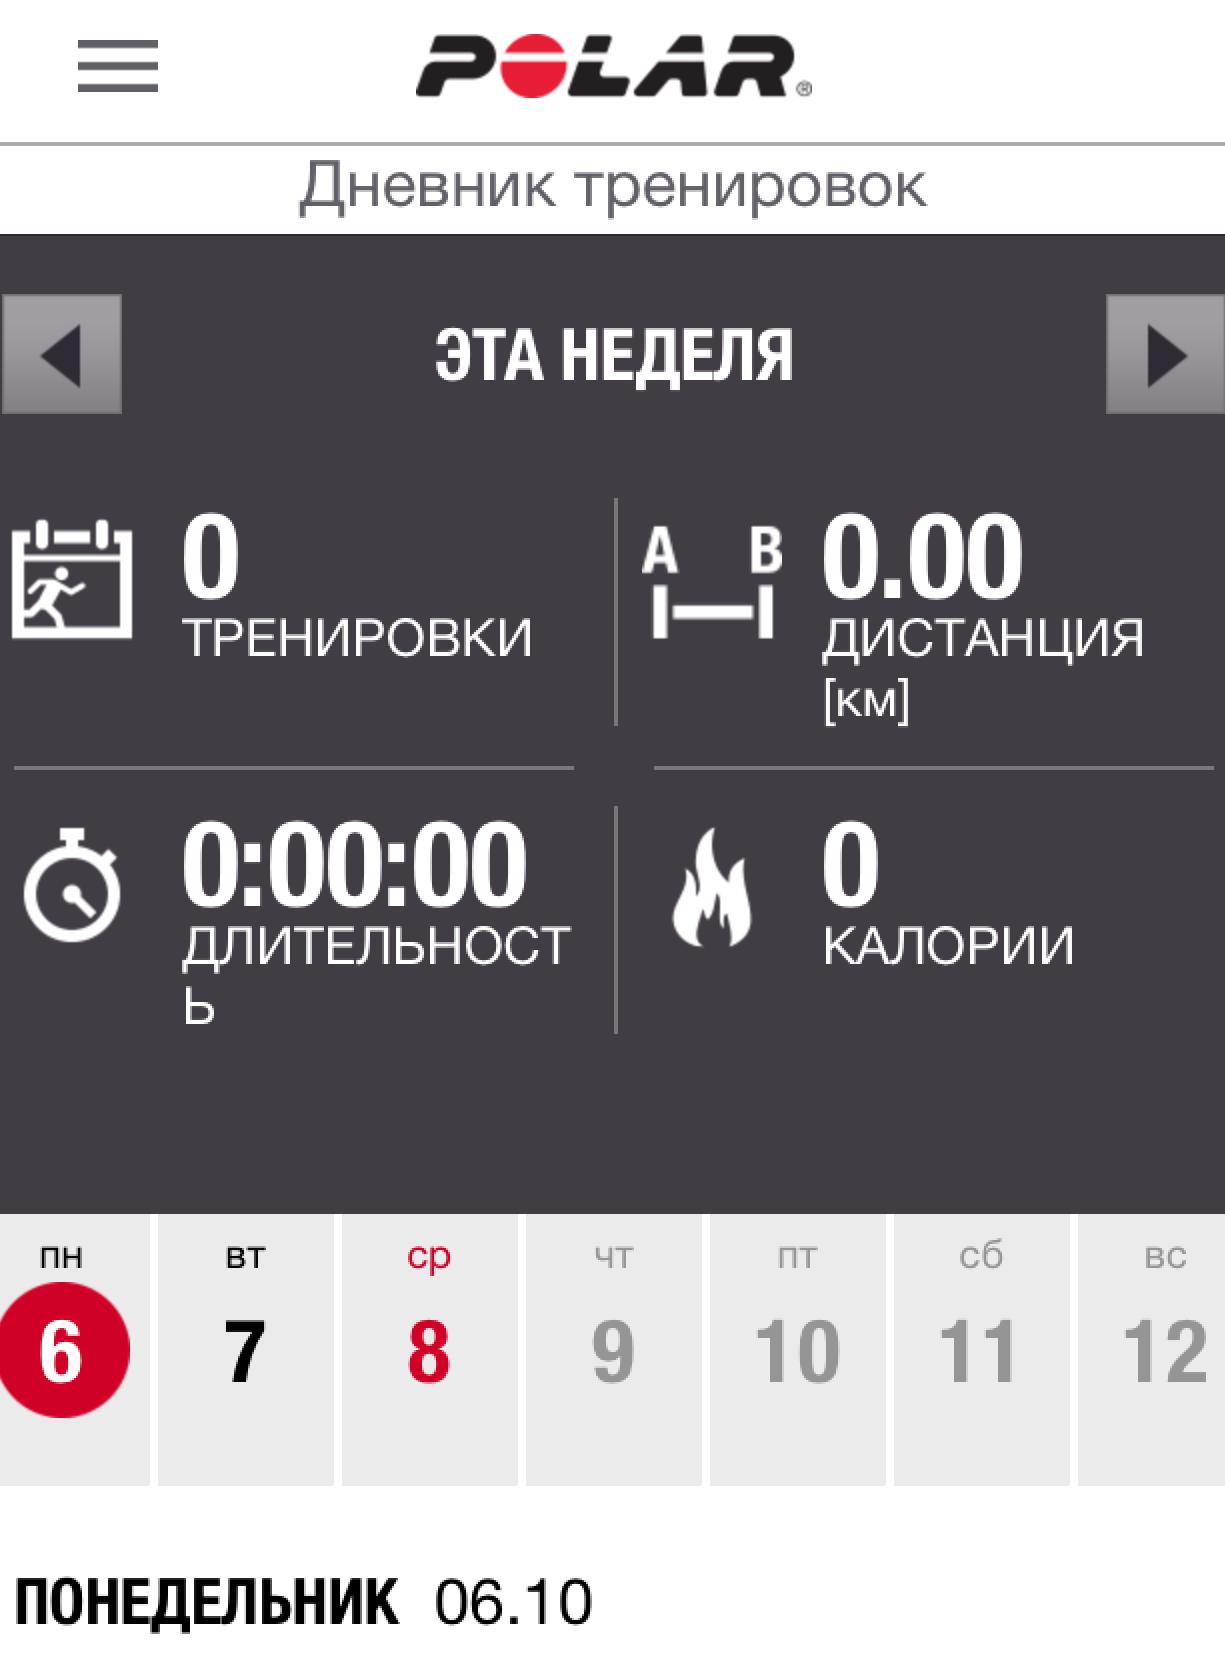 Polar Flow на русском языке!